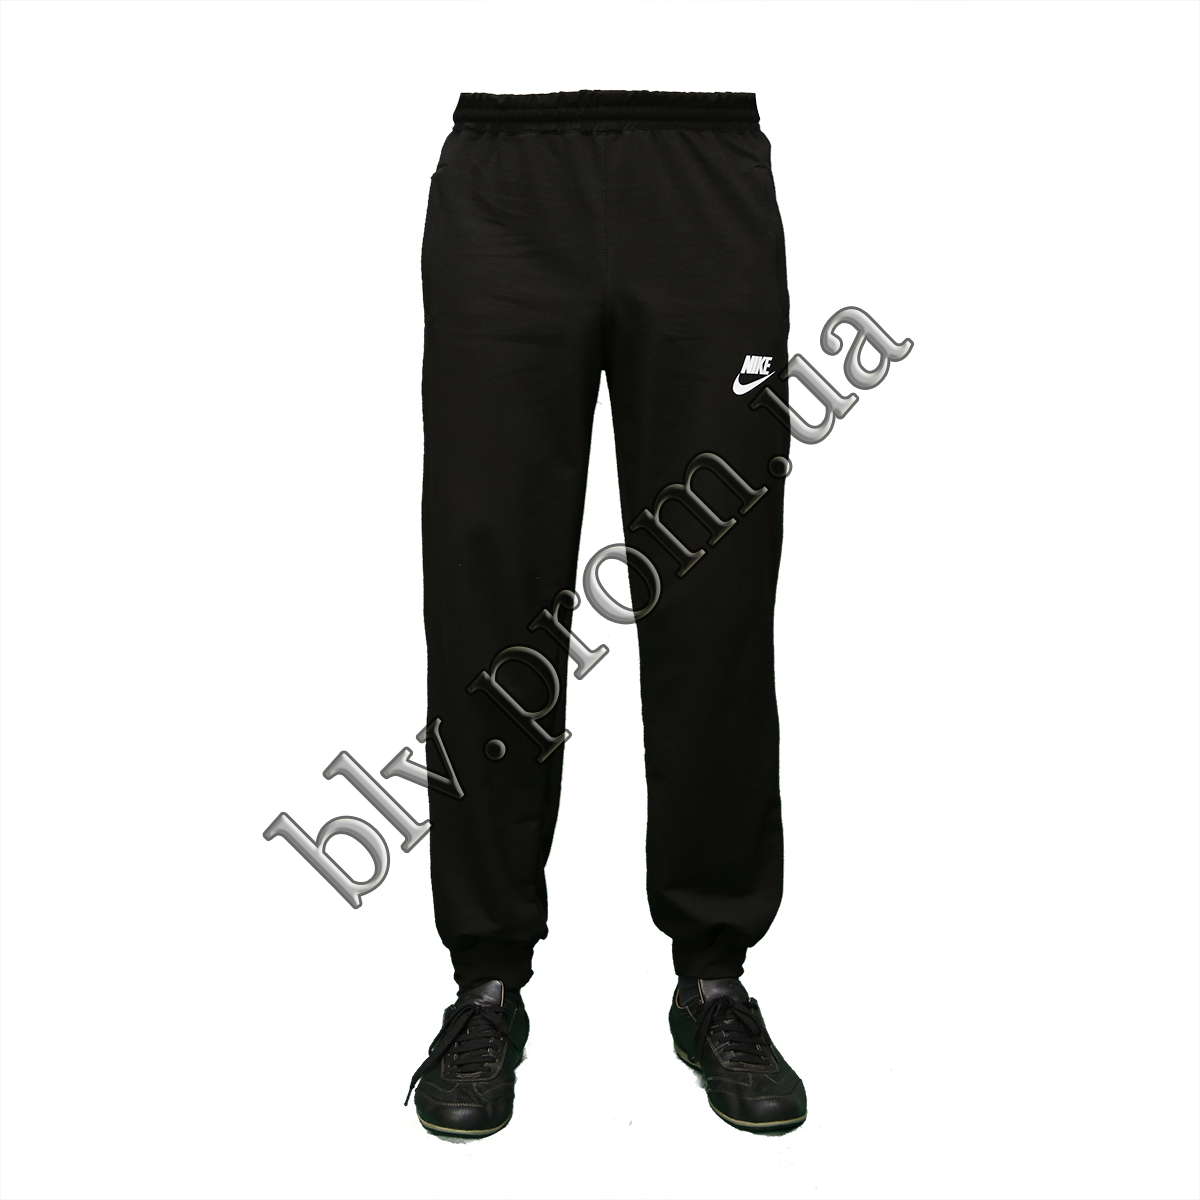 Трикотажные мужские брюки на манжете пр-во Украина  2523N